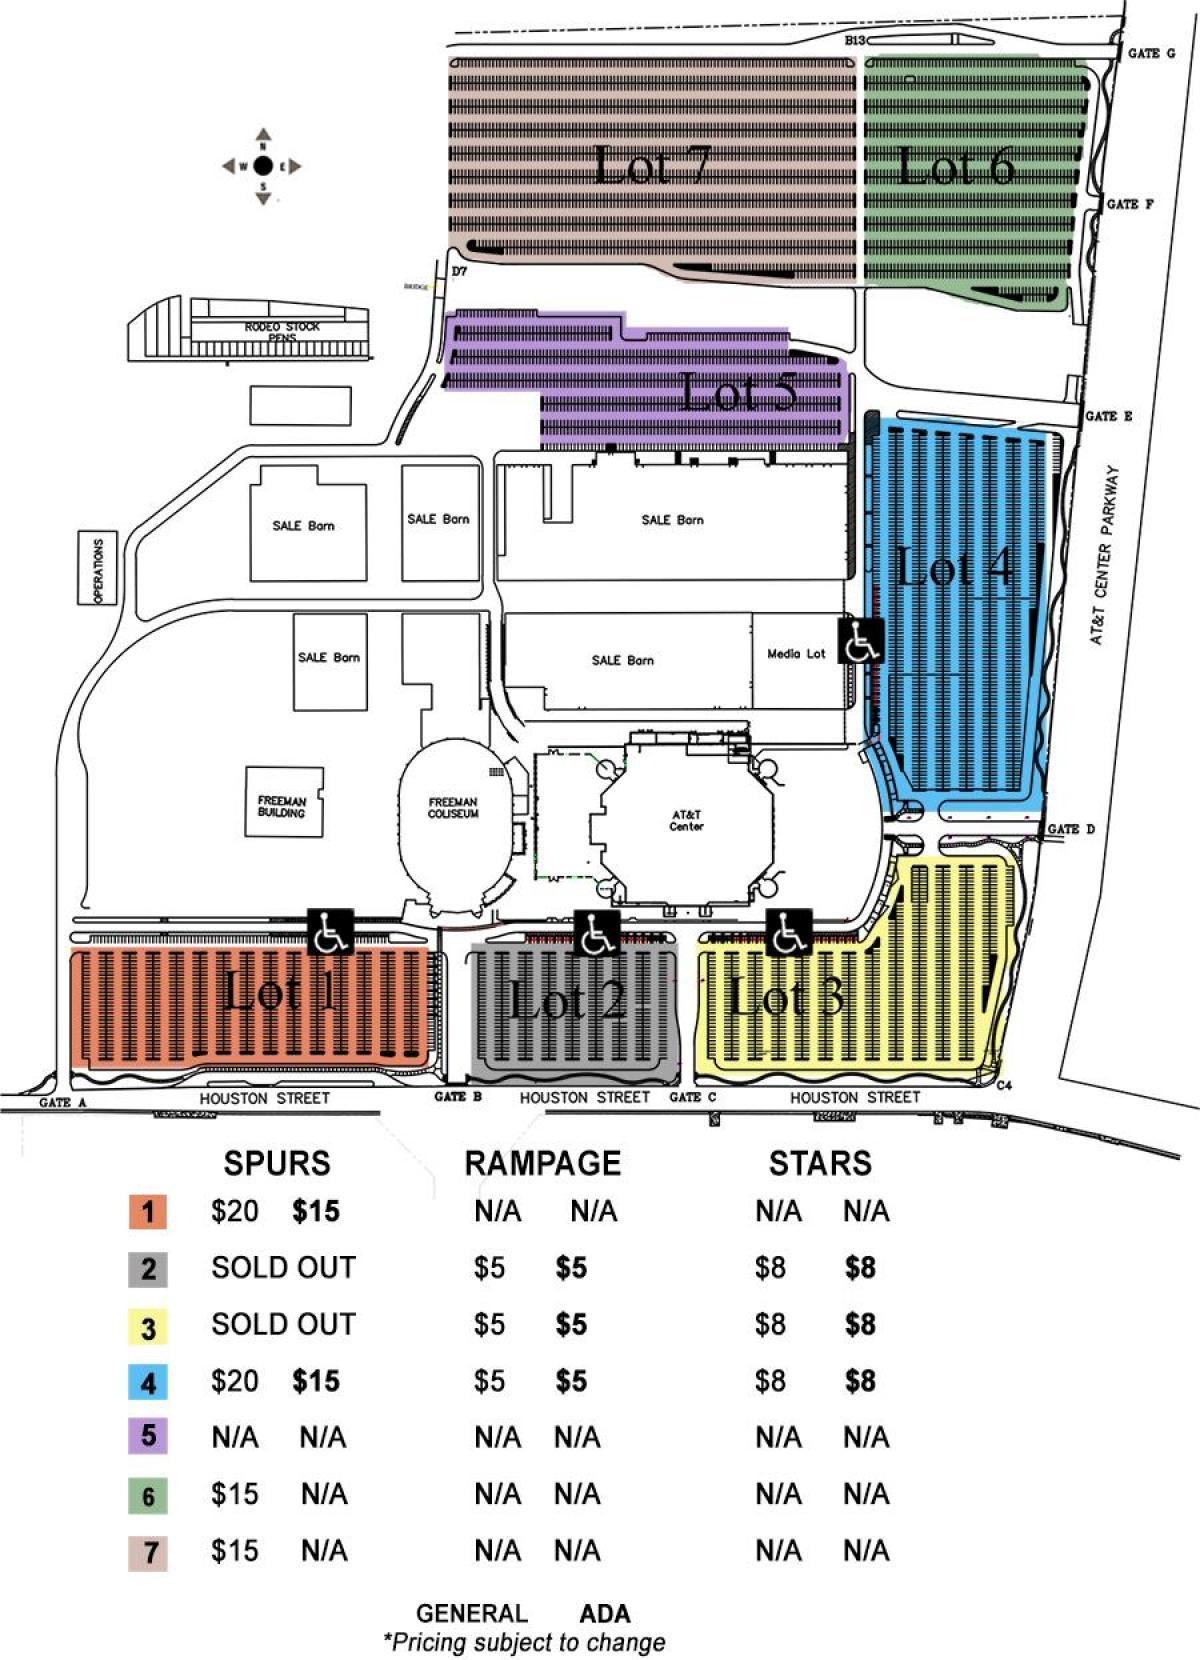 Att Parking Map : parking, Stadium, Parking, (Texas